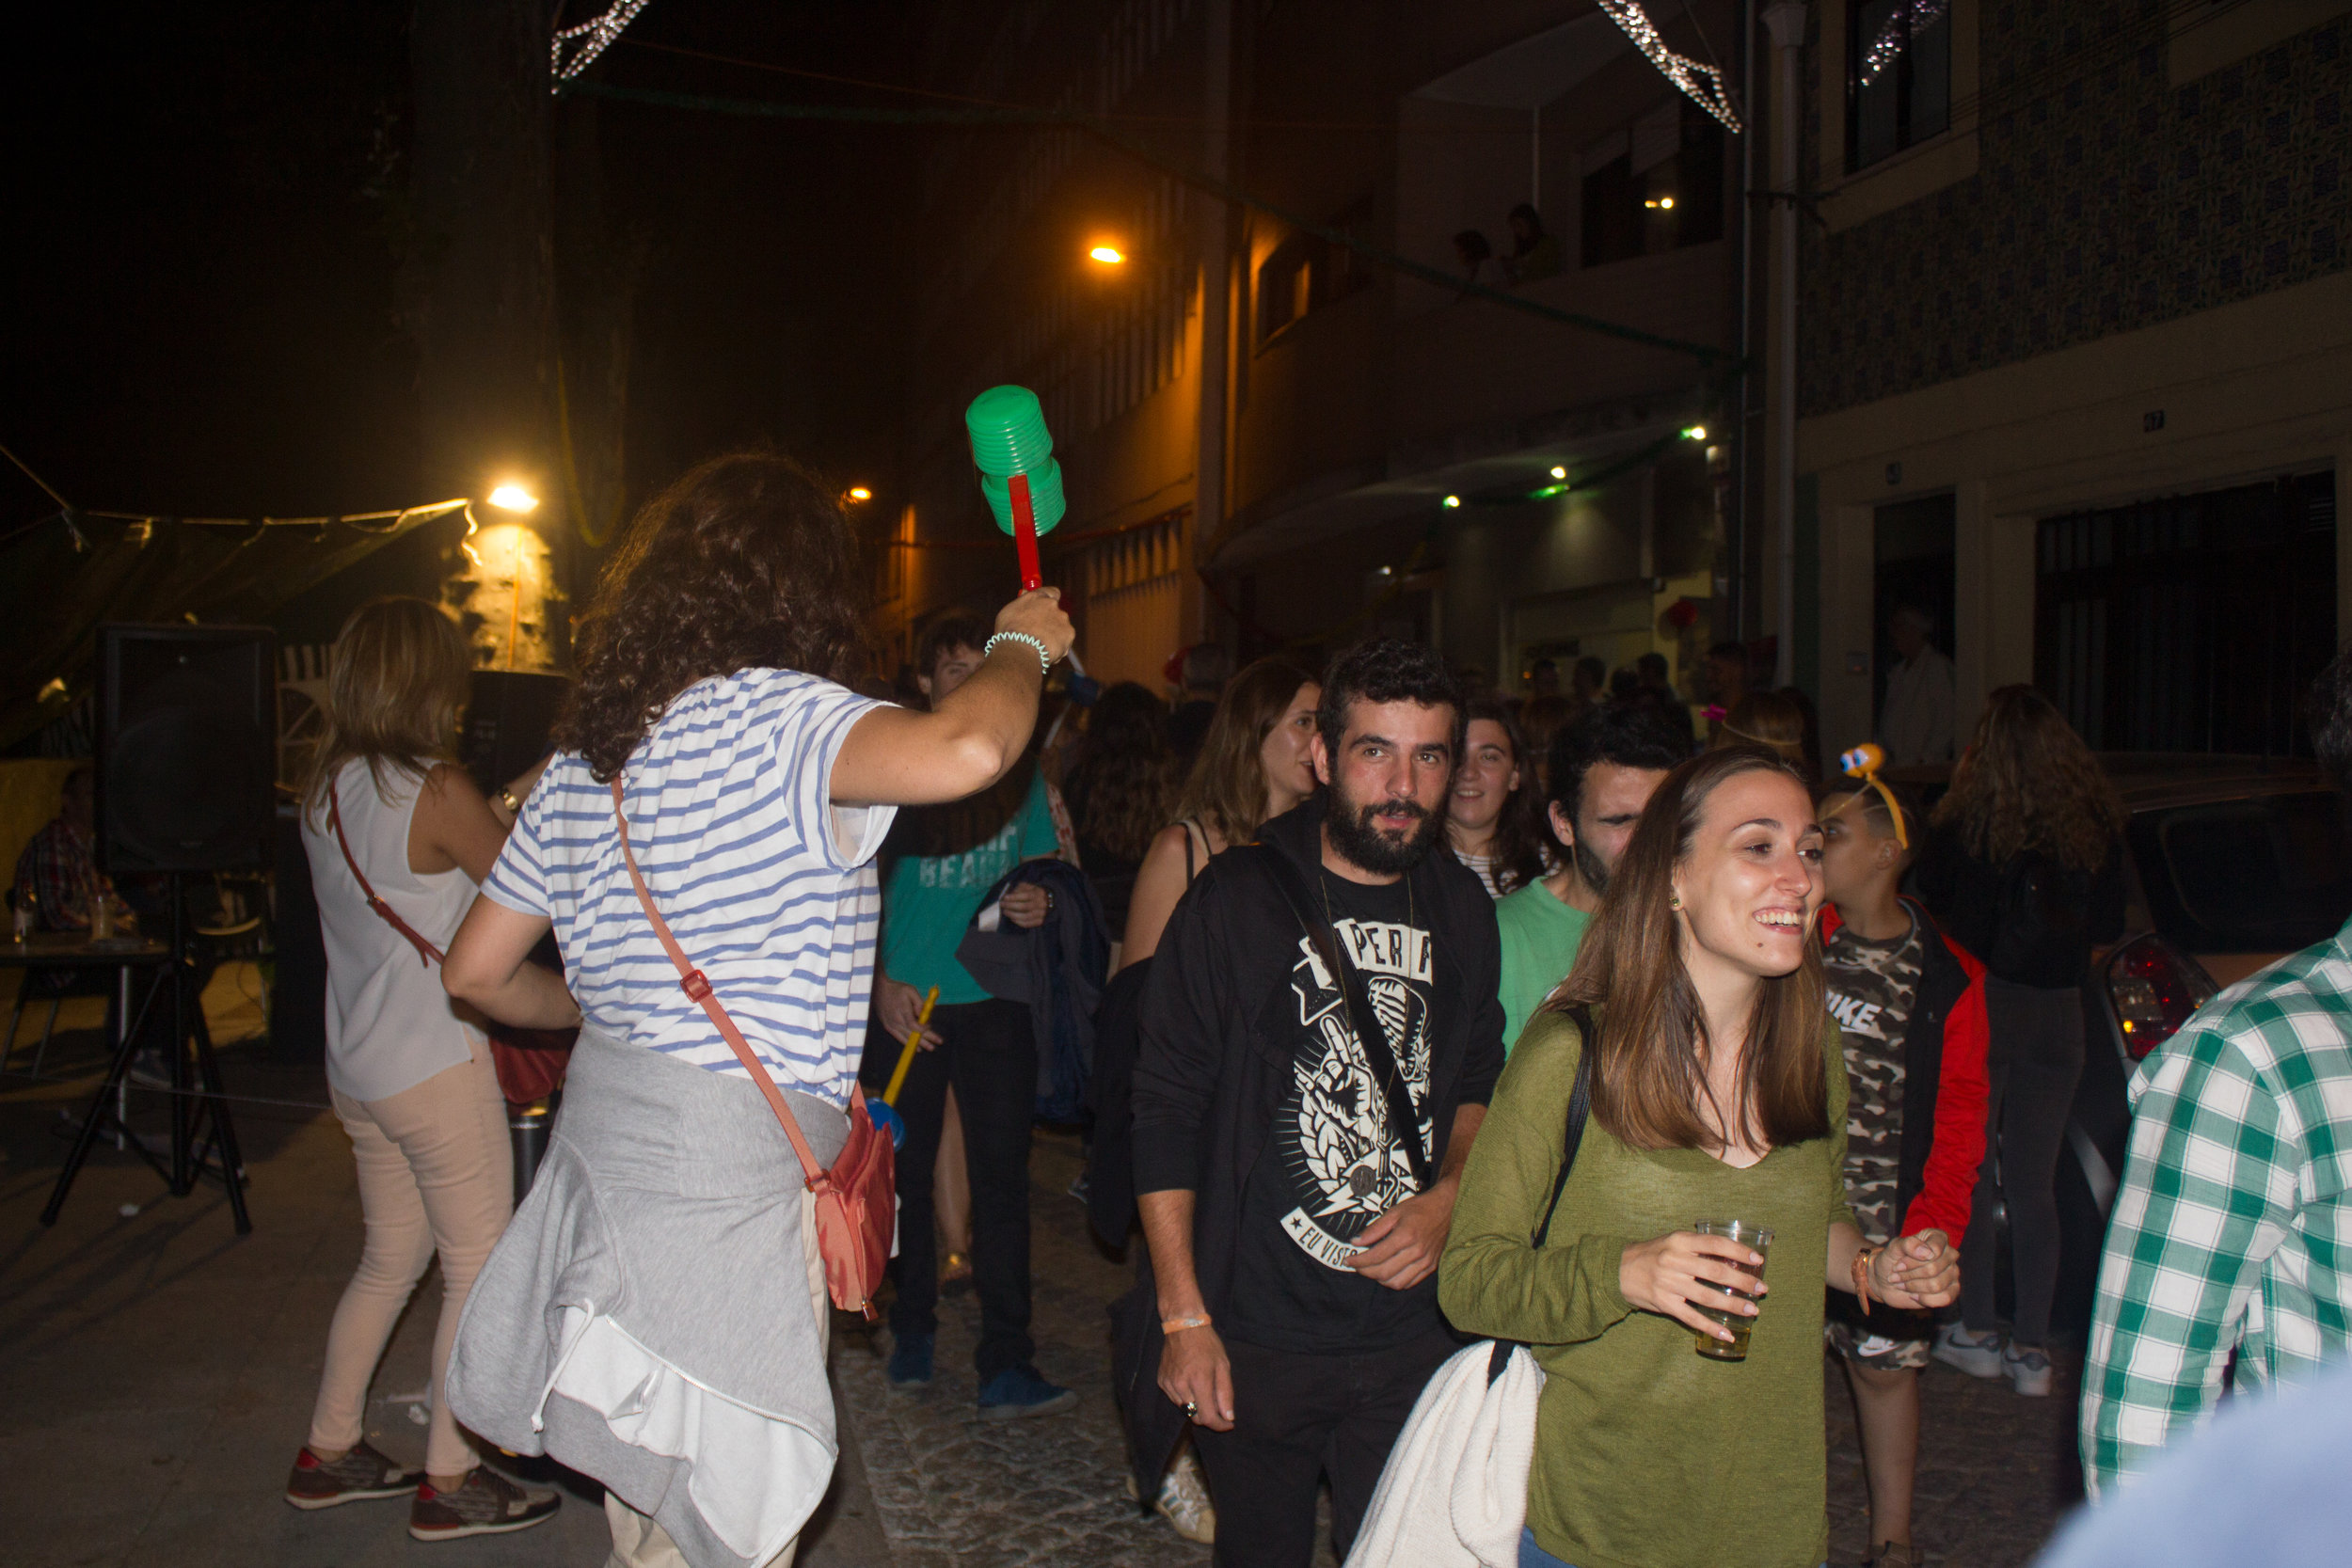 Joana bopping people on the head